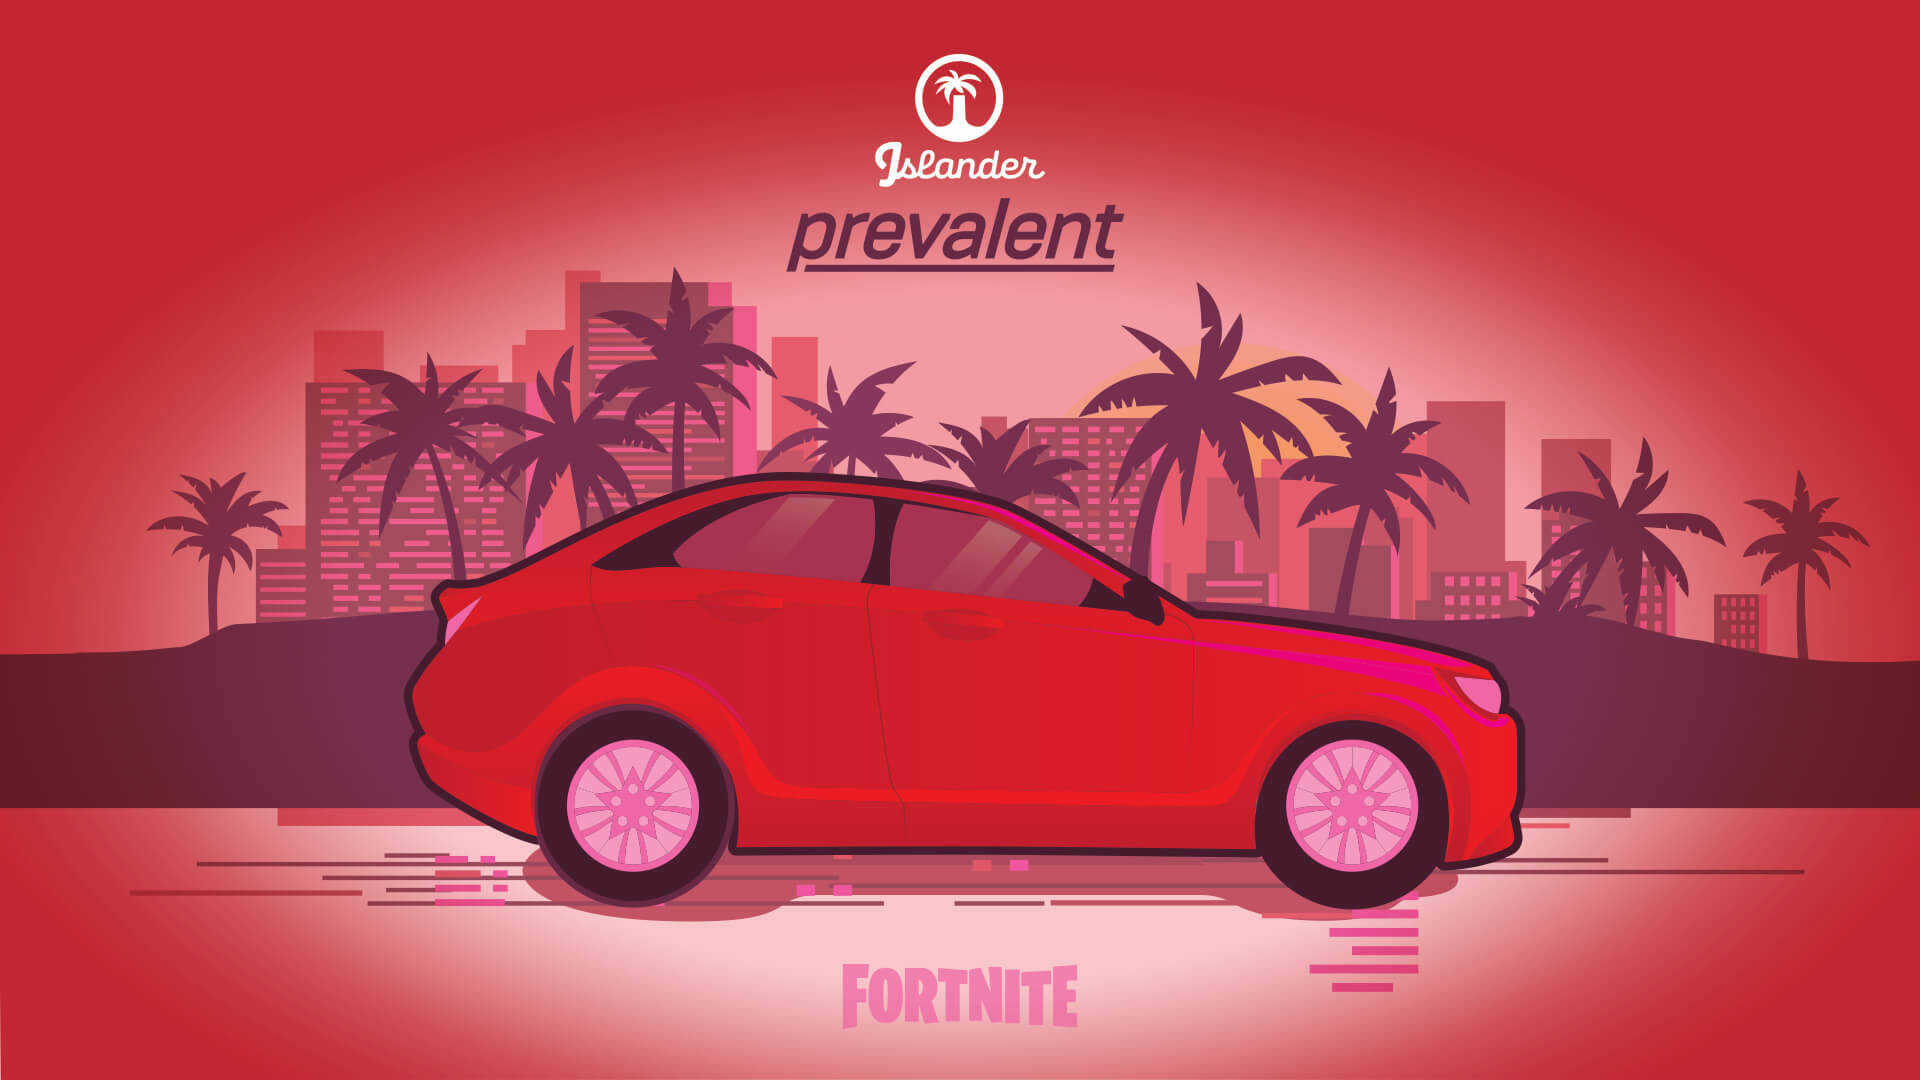 Fortnite auto